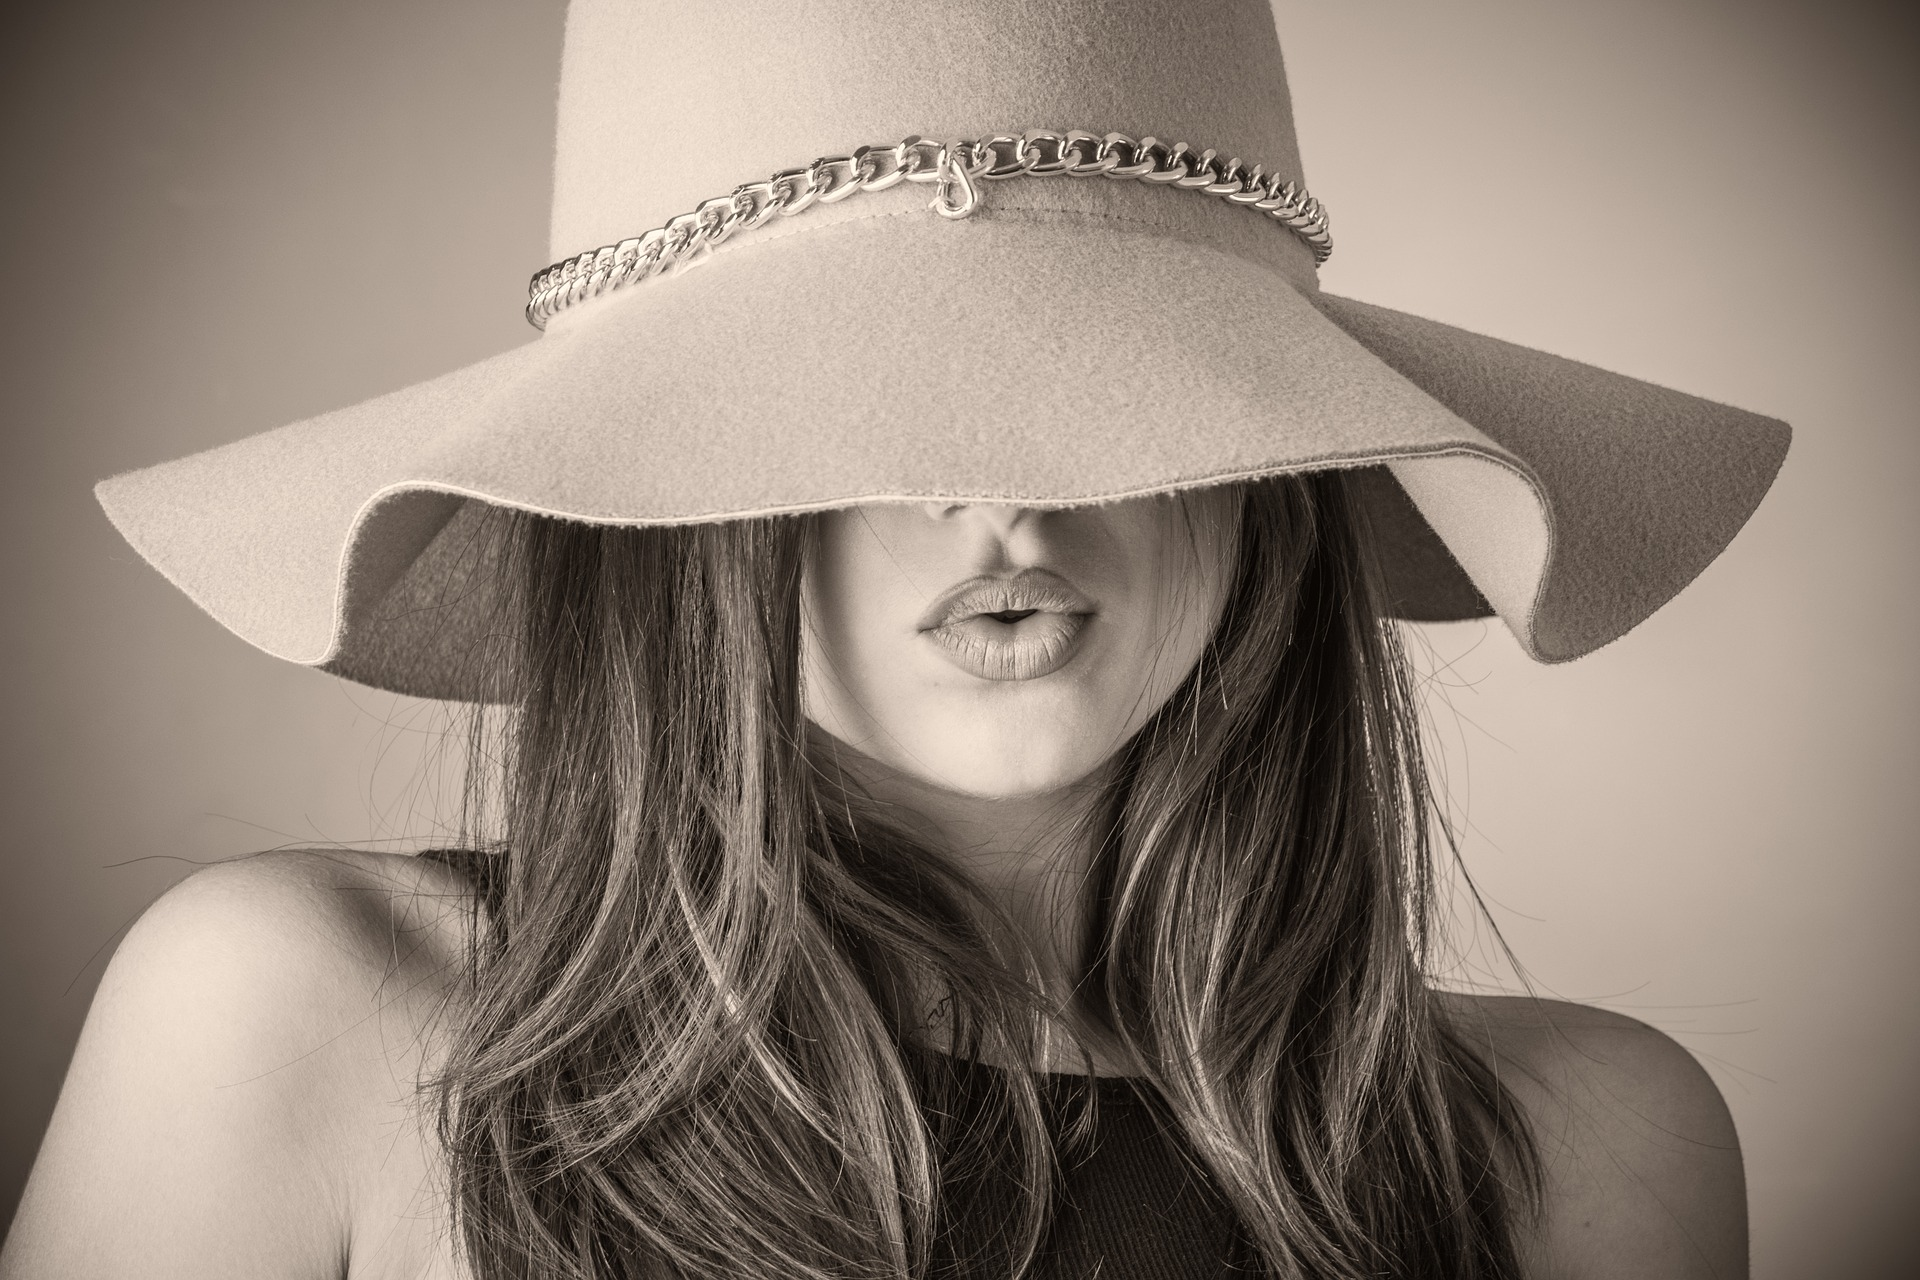 femei frumoase singure - sfatulparintilor.ro - pixabay_com - fashion-2309519_1920